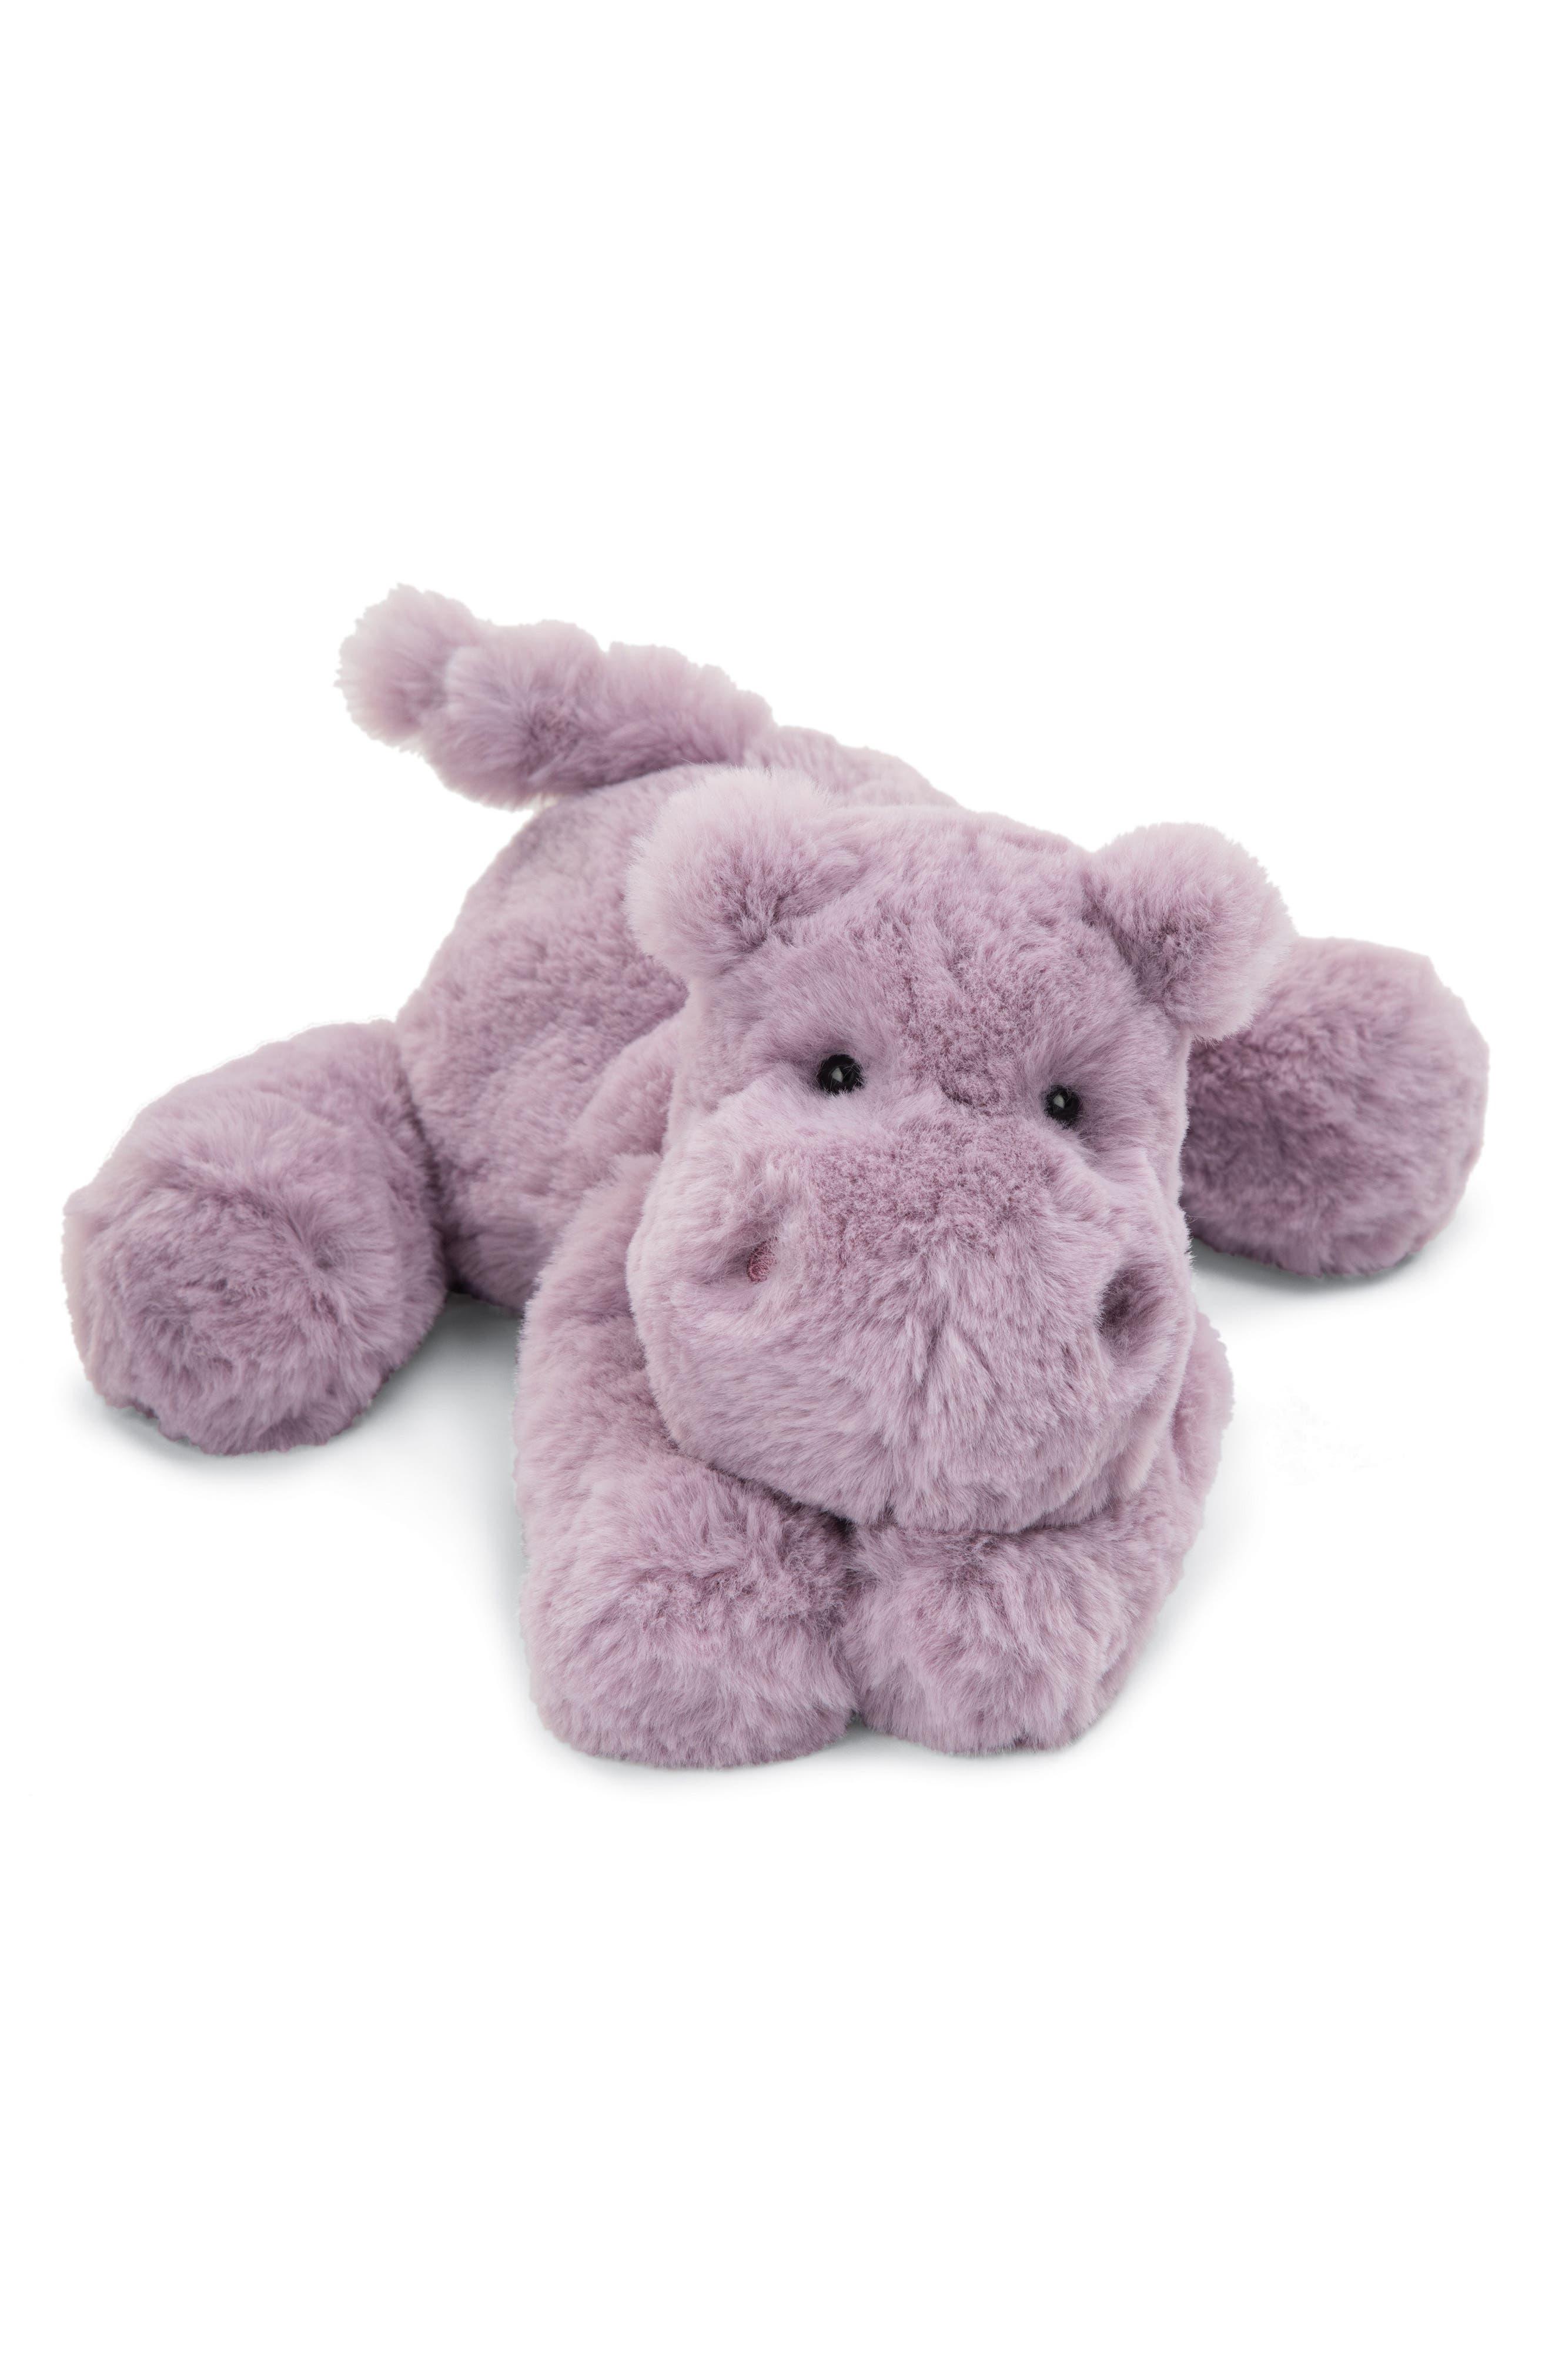 Smudge Hippo Stuffed Animal,                             Main thumbnail 1, color,                             Lilac